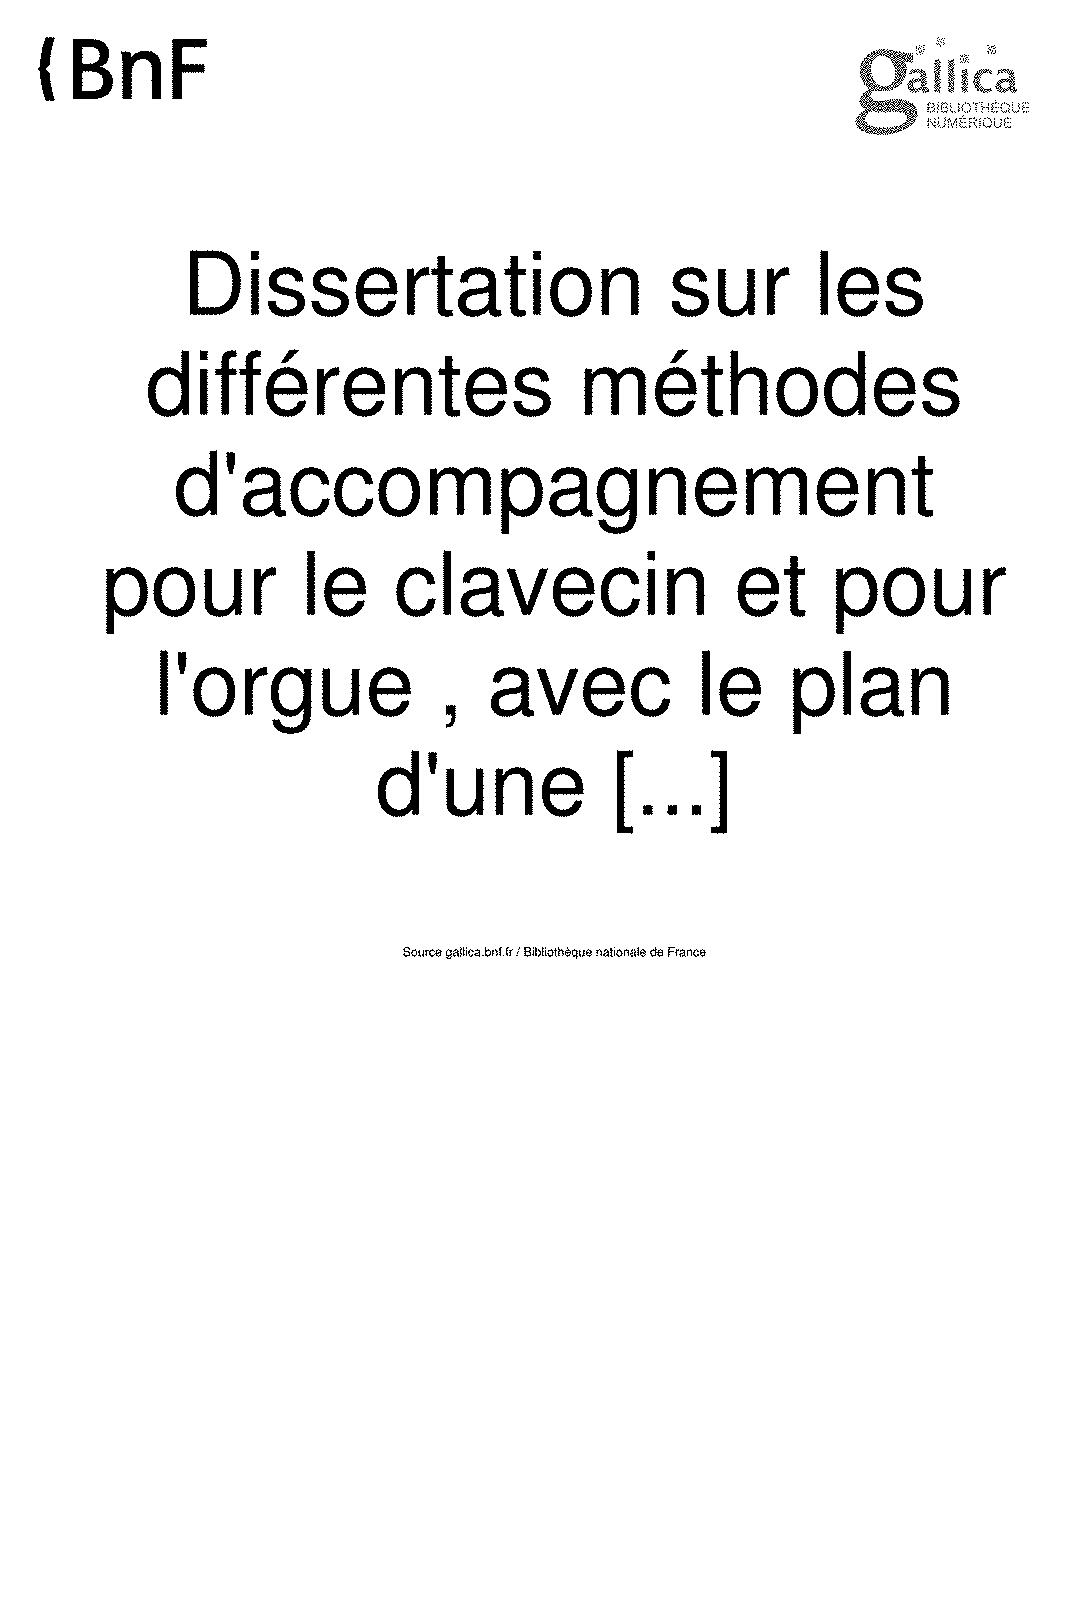 Dissertation sur